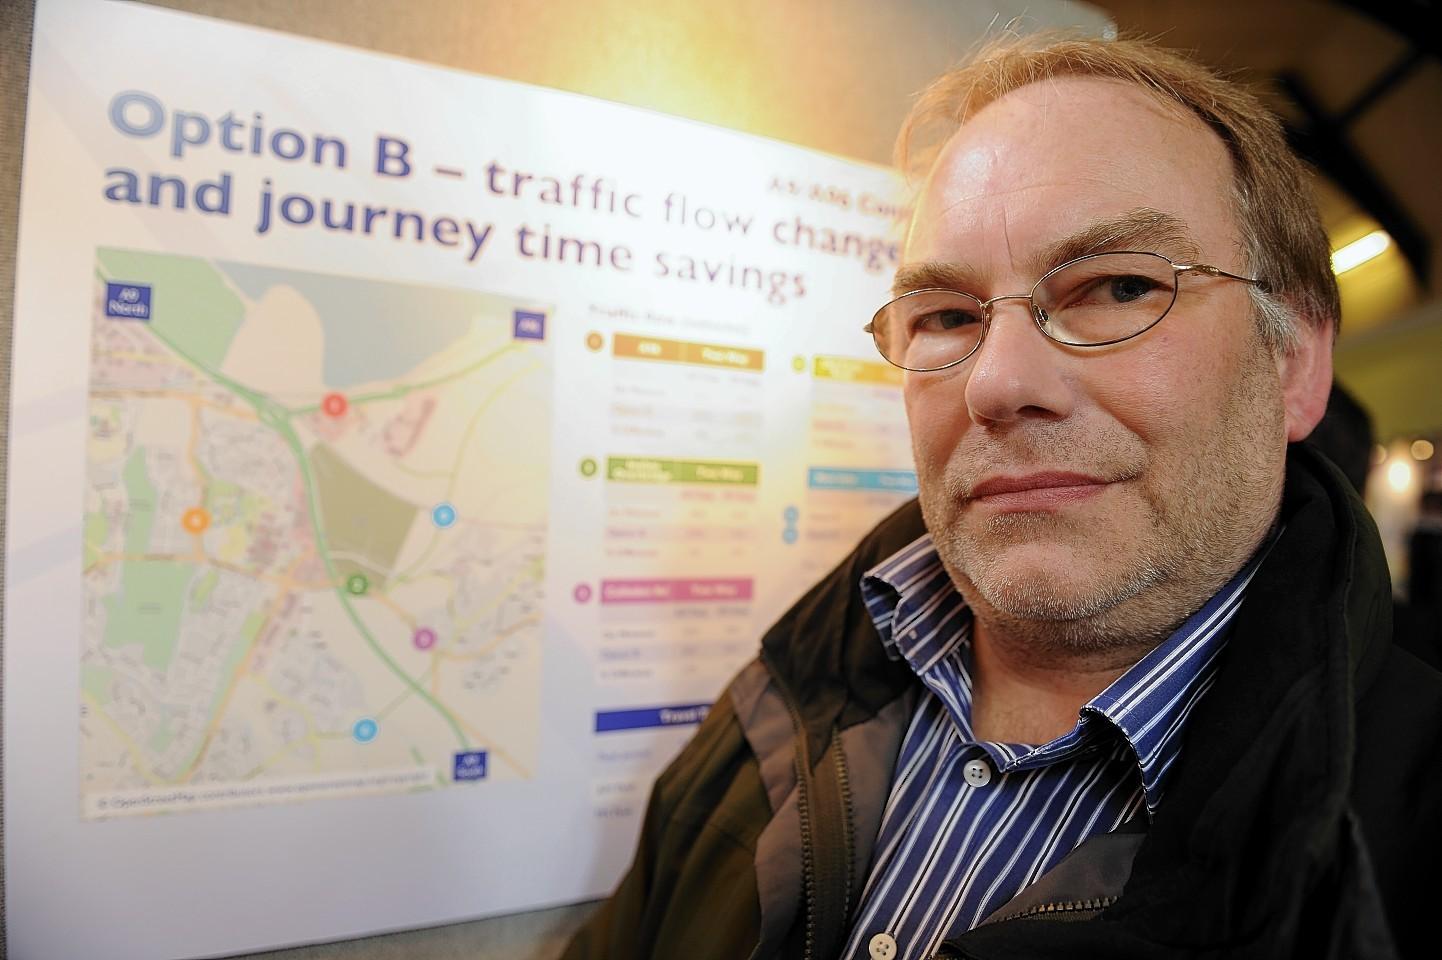 Inverness road exhibition